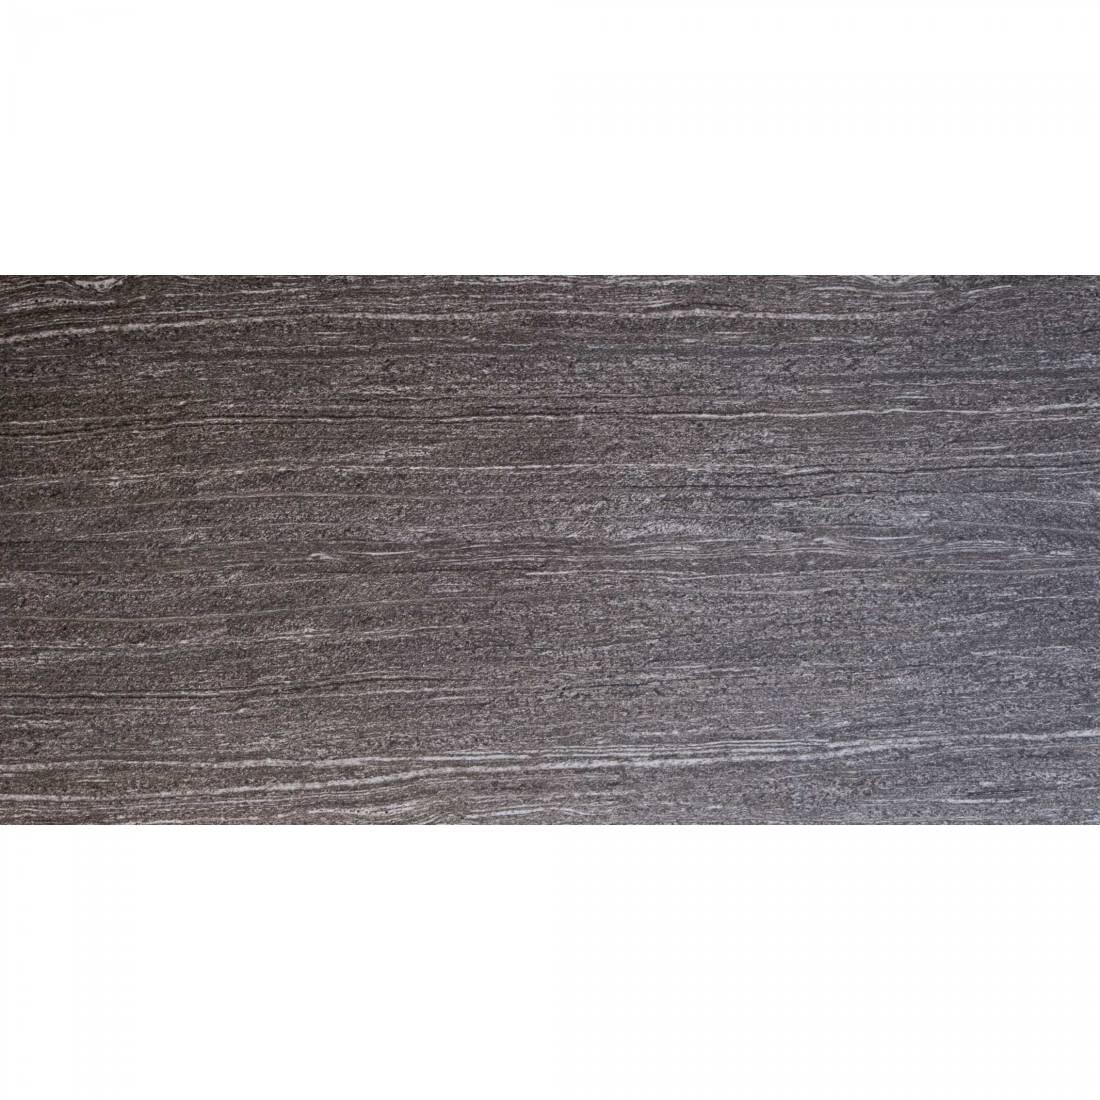 Verso 30x60 Anthracite 1